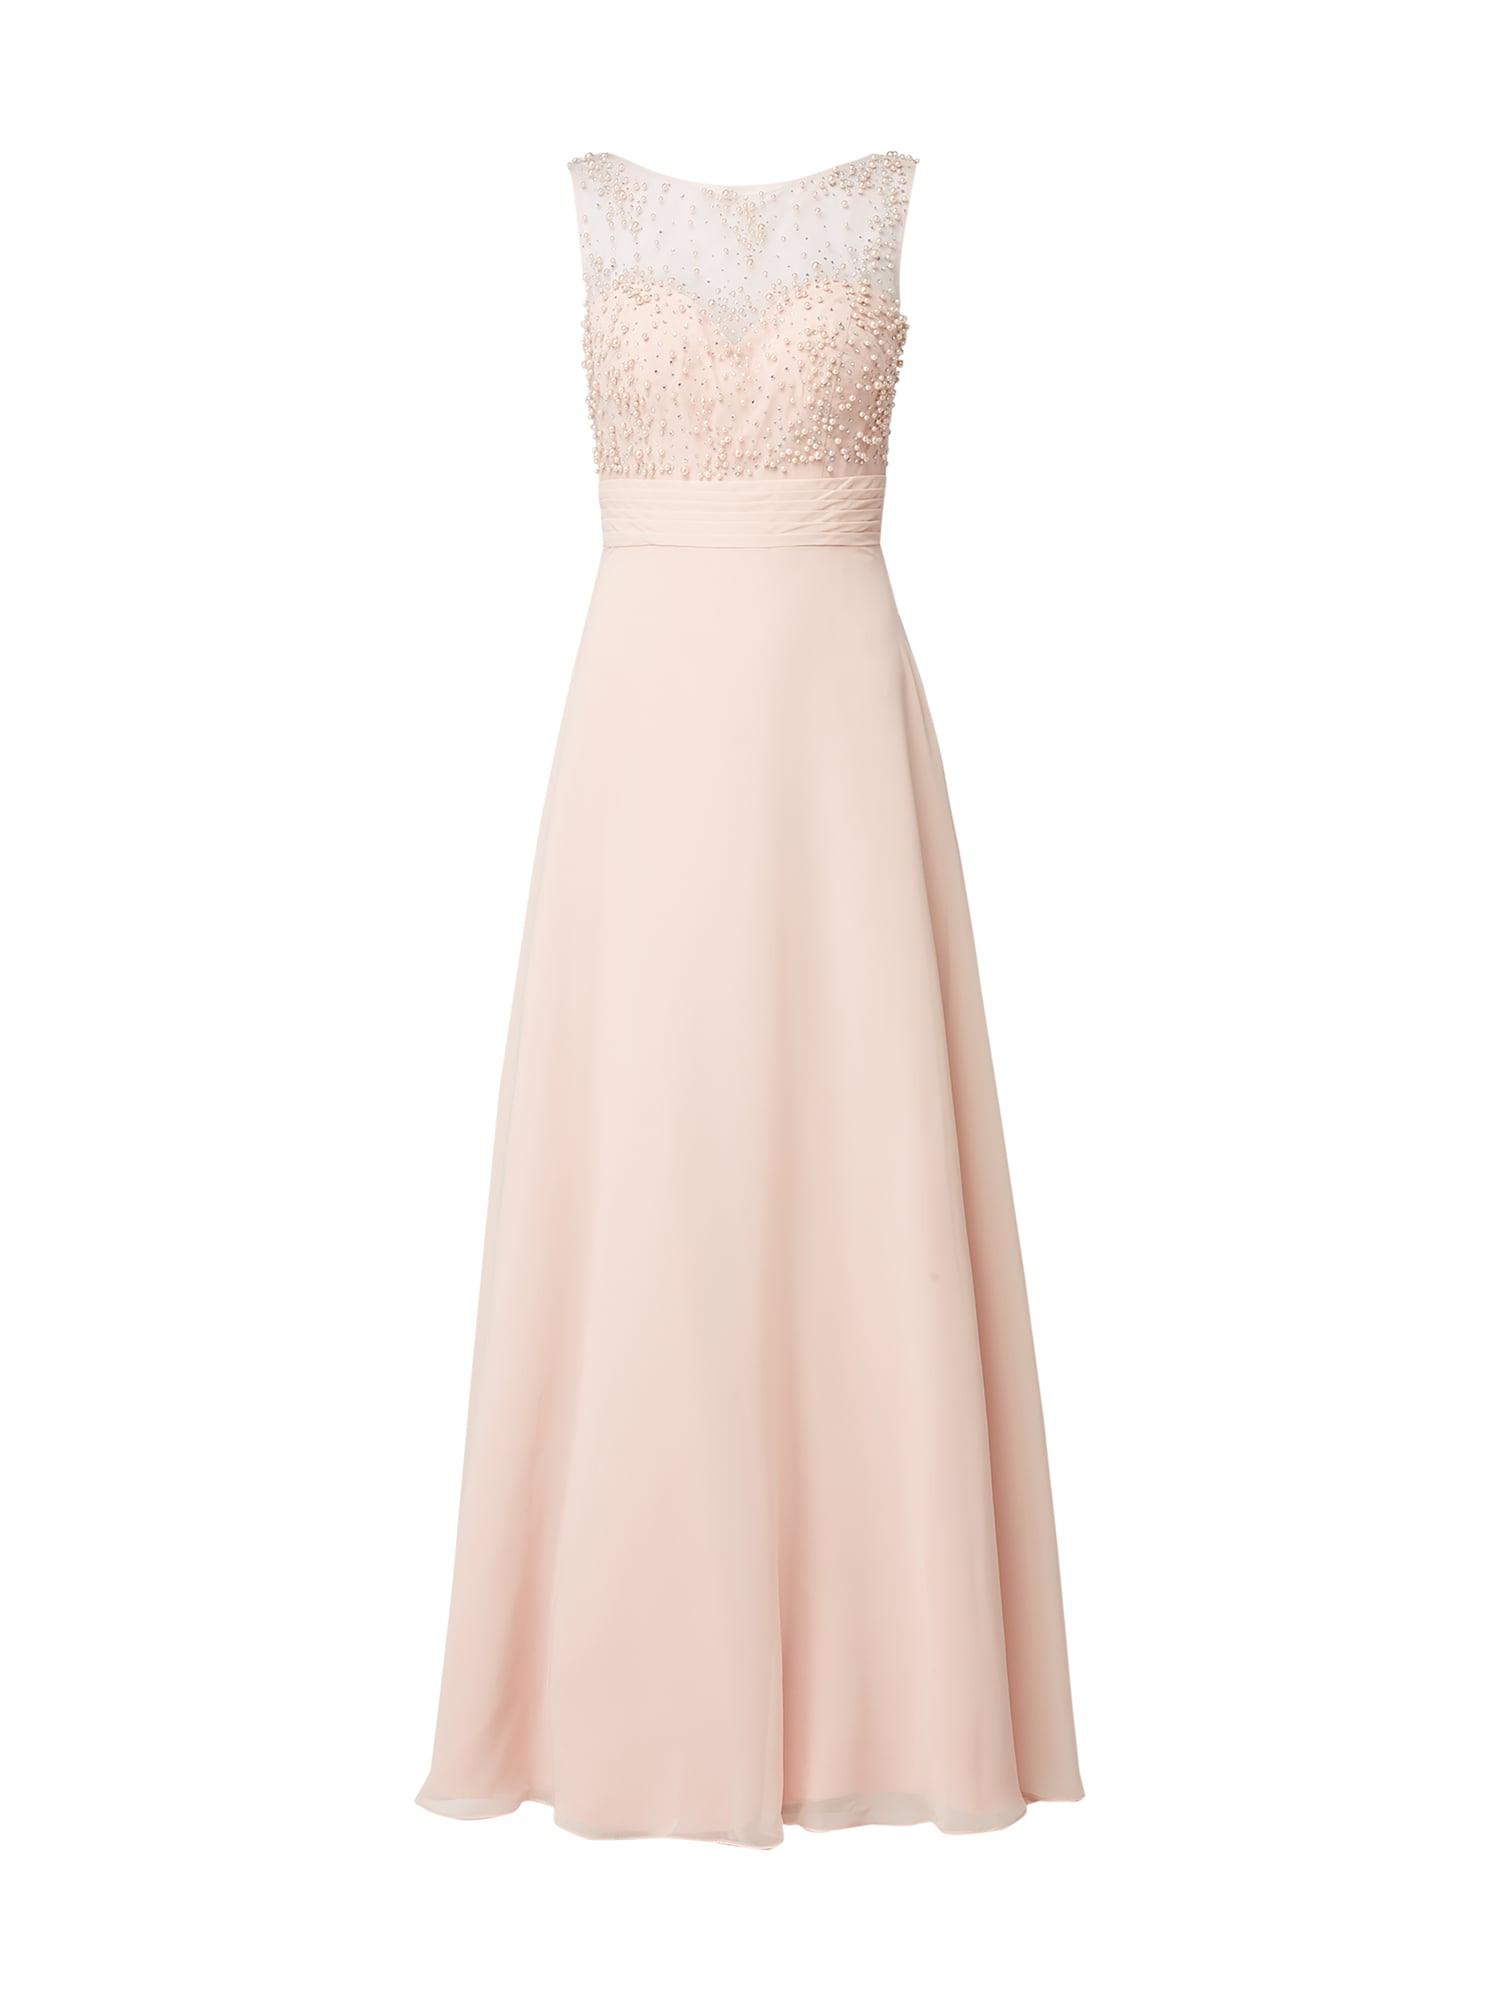 Abend Großartig Luxuar Abendkleid Vertrieb Luxurius Luxuar Abendkleid Ärmel